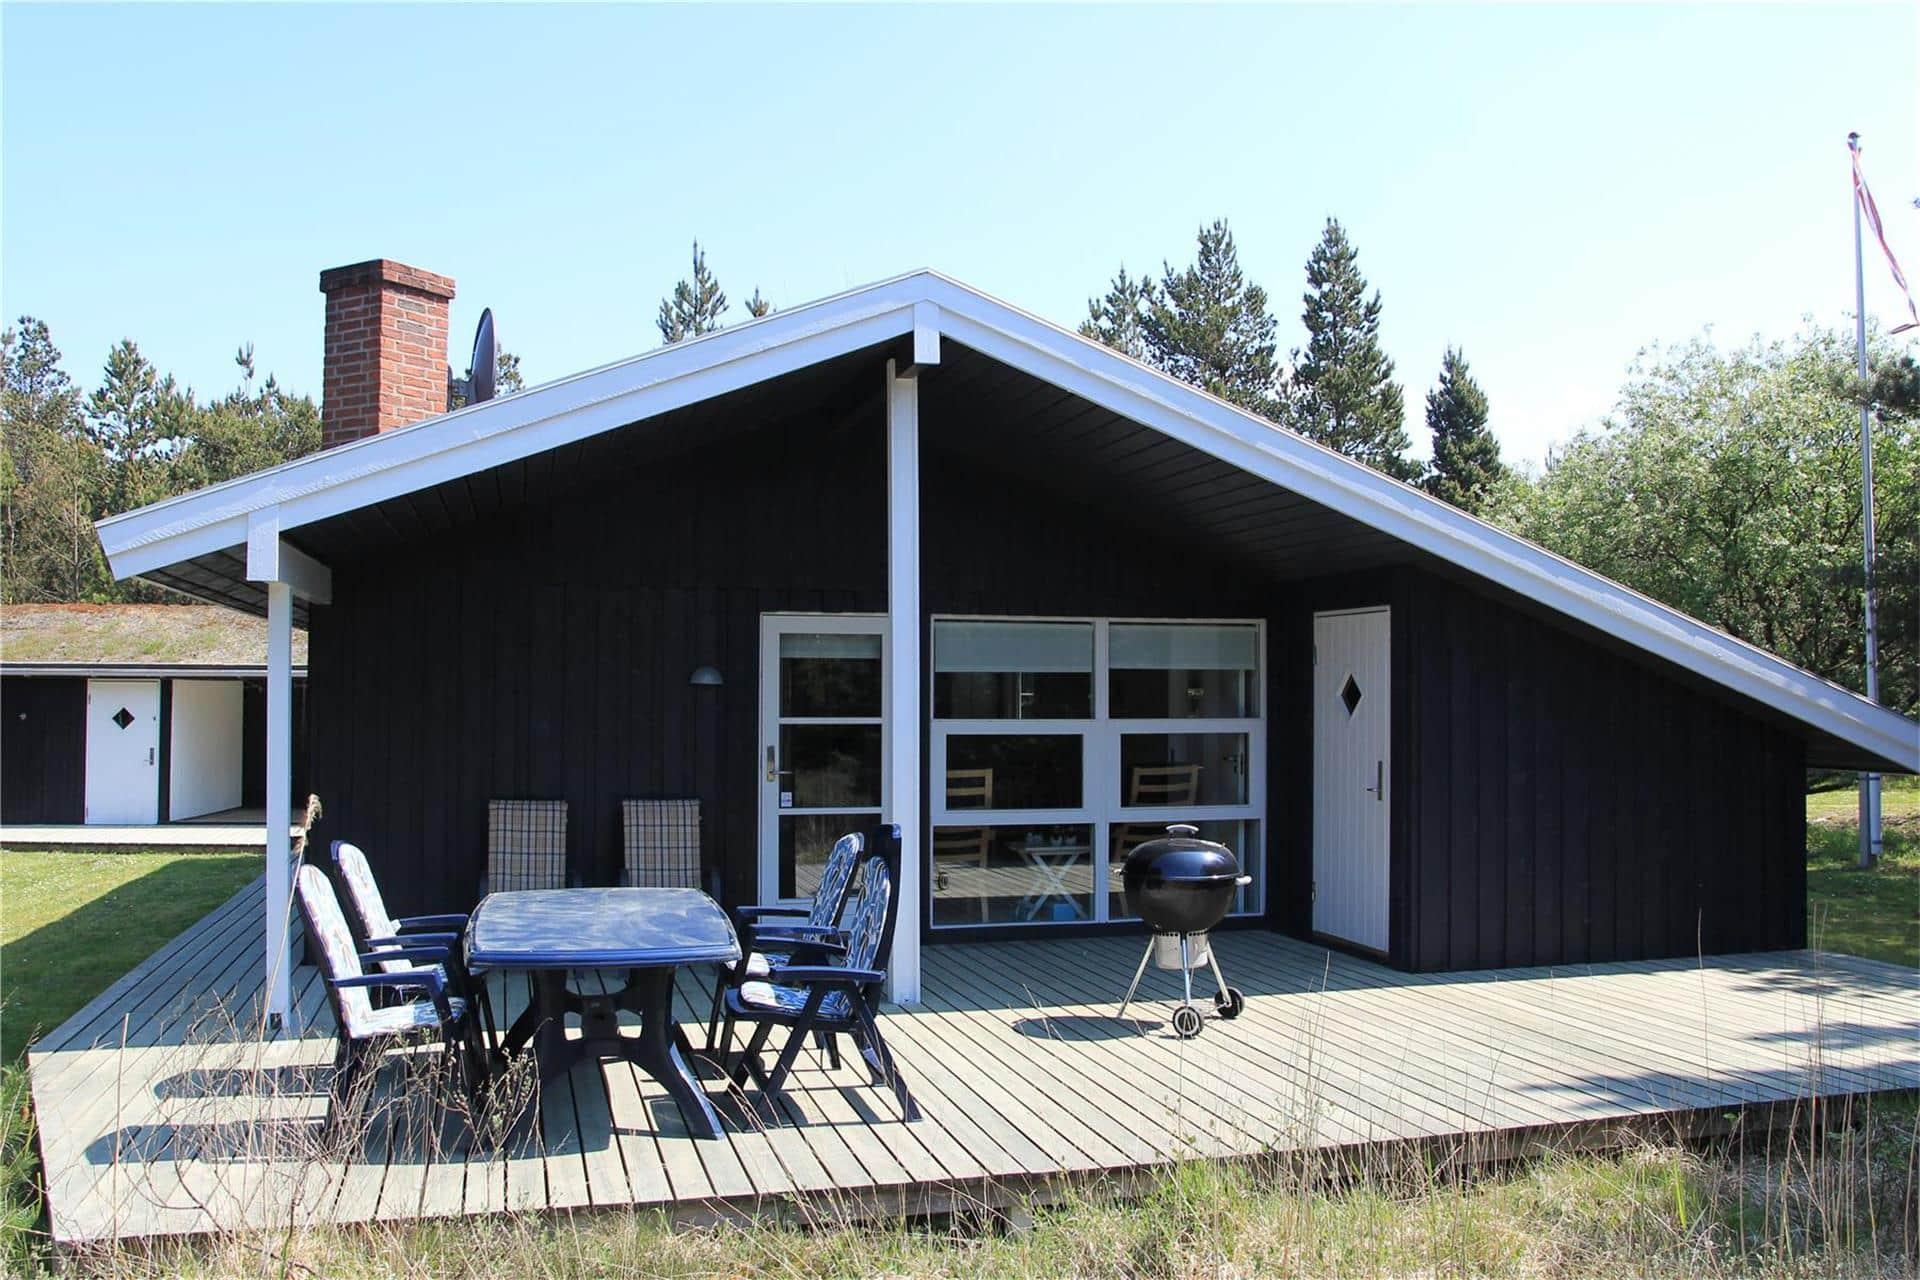 Bild 1-11 Ferienhaus 0055, Blåbærvej 5, DK - 6792 Rømø